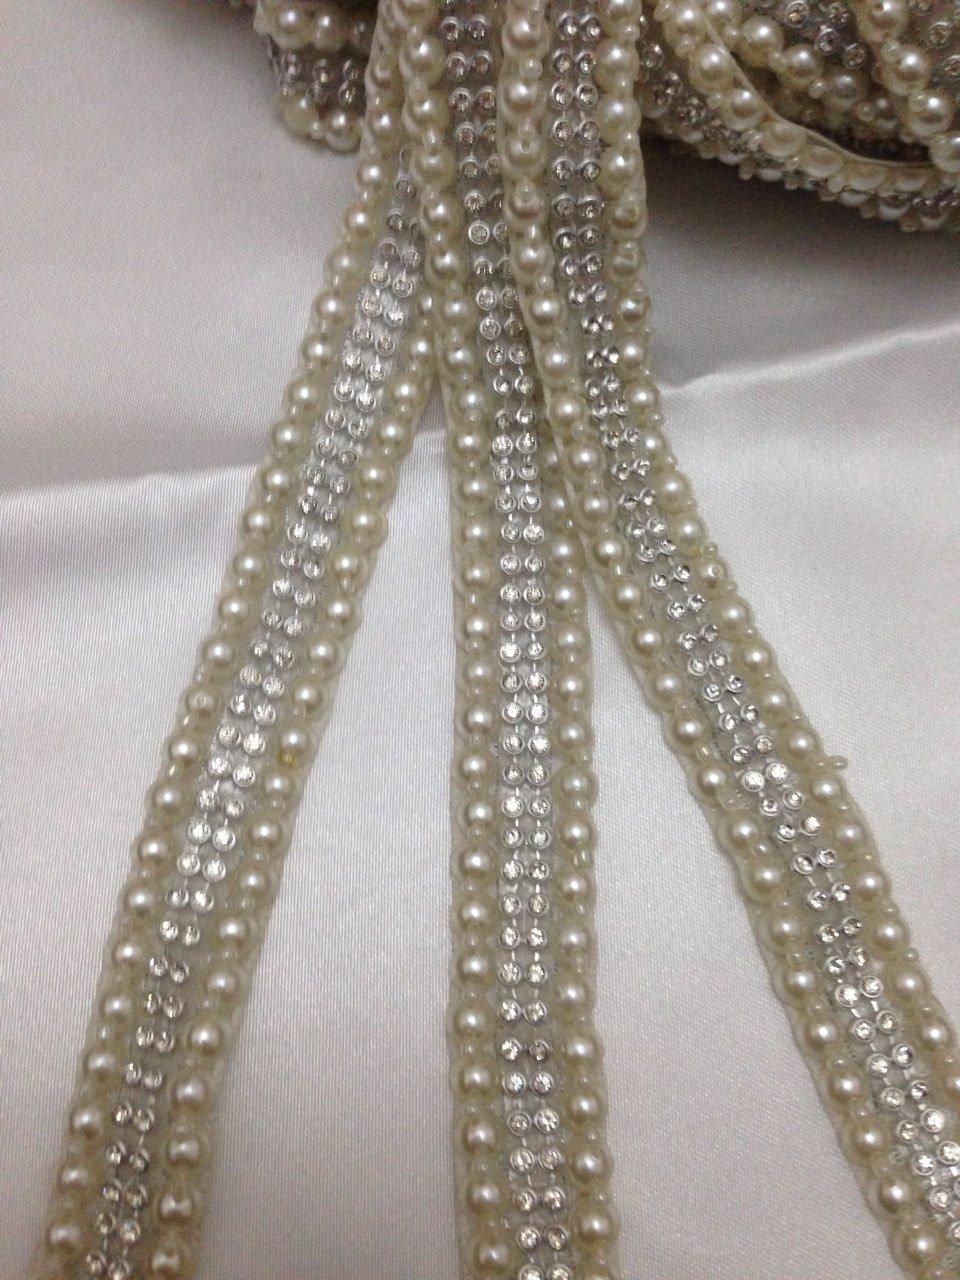 avorio perla argento in rilievo Daimonte Luxury wedding applique Trim bordo costume da sposa 0, 9m x 2cm D3 Mctrimmings